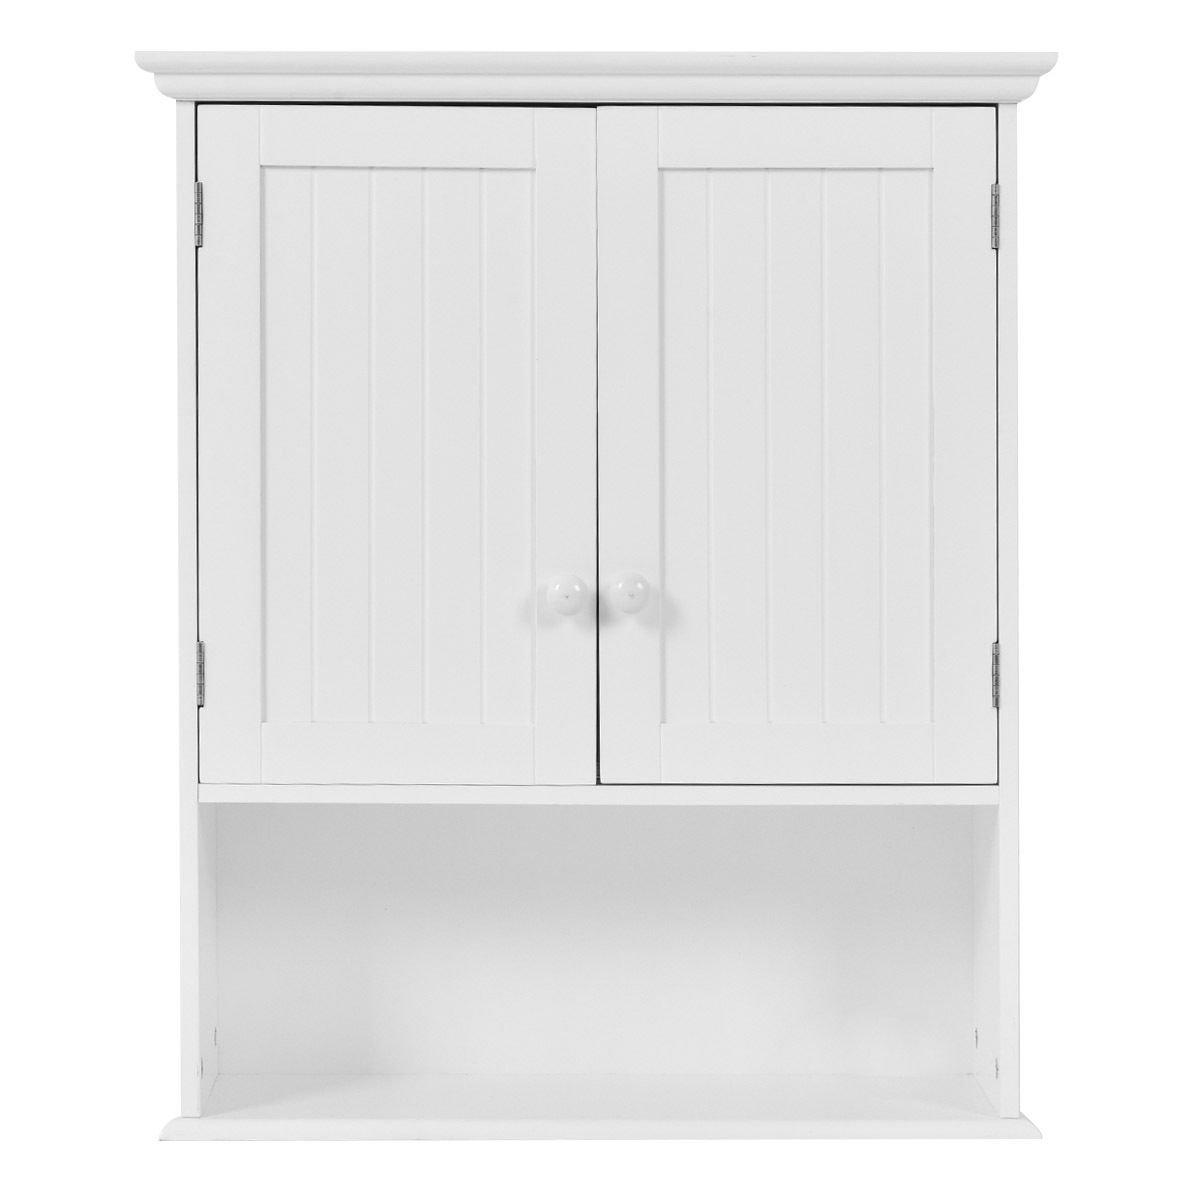 TANGKULA Wall Mount Bathroom Cabinet Wooden Medicine Cabinet Storage ...